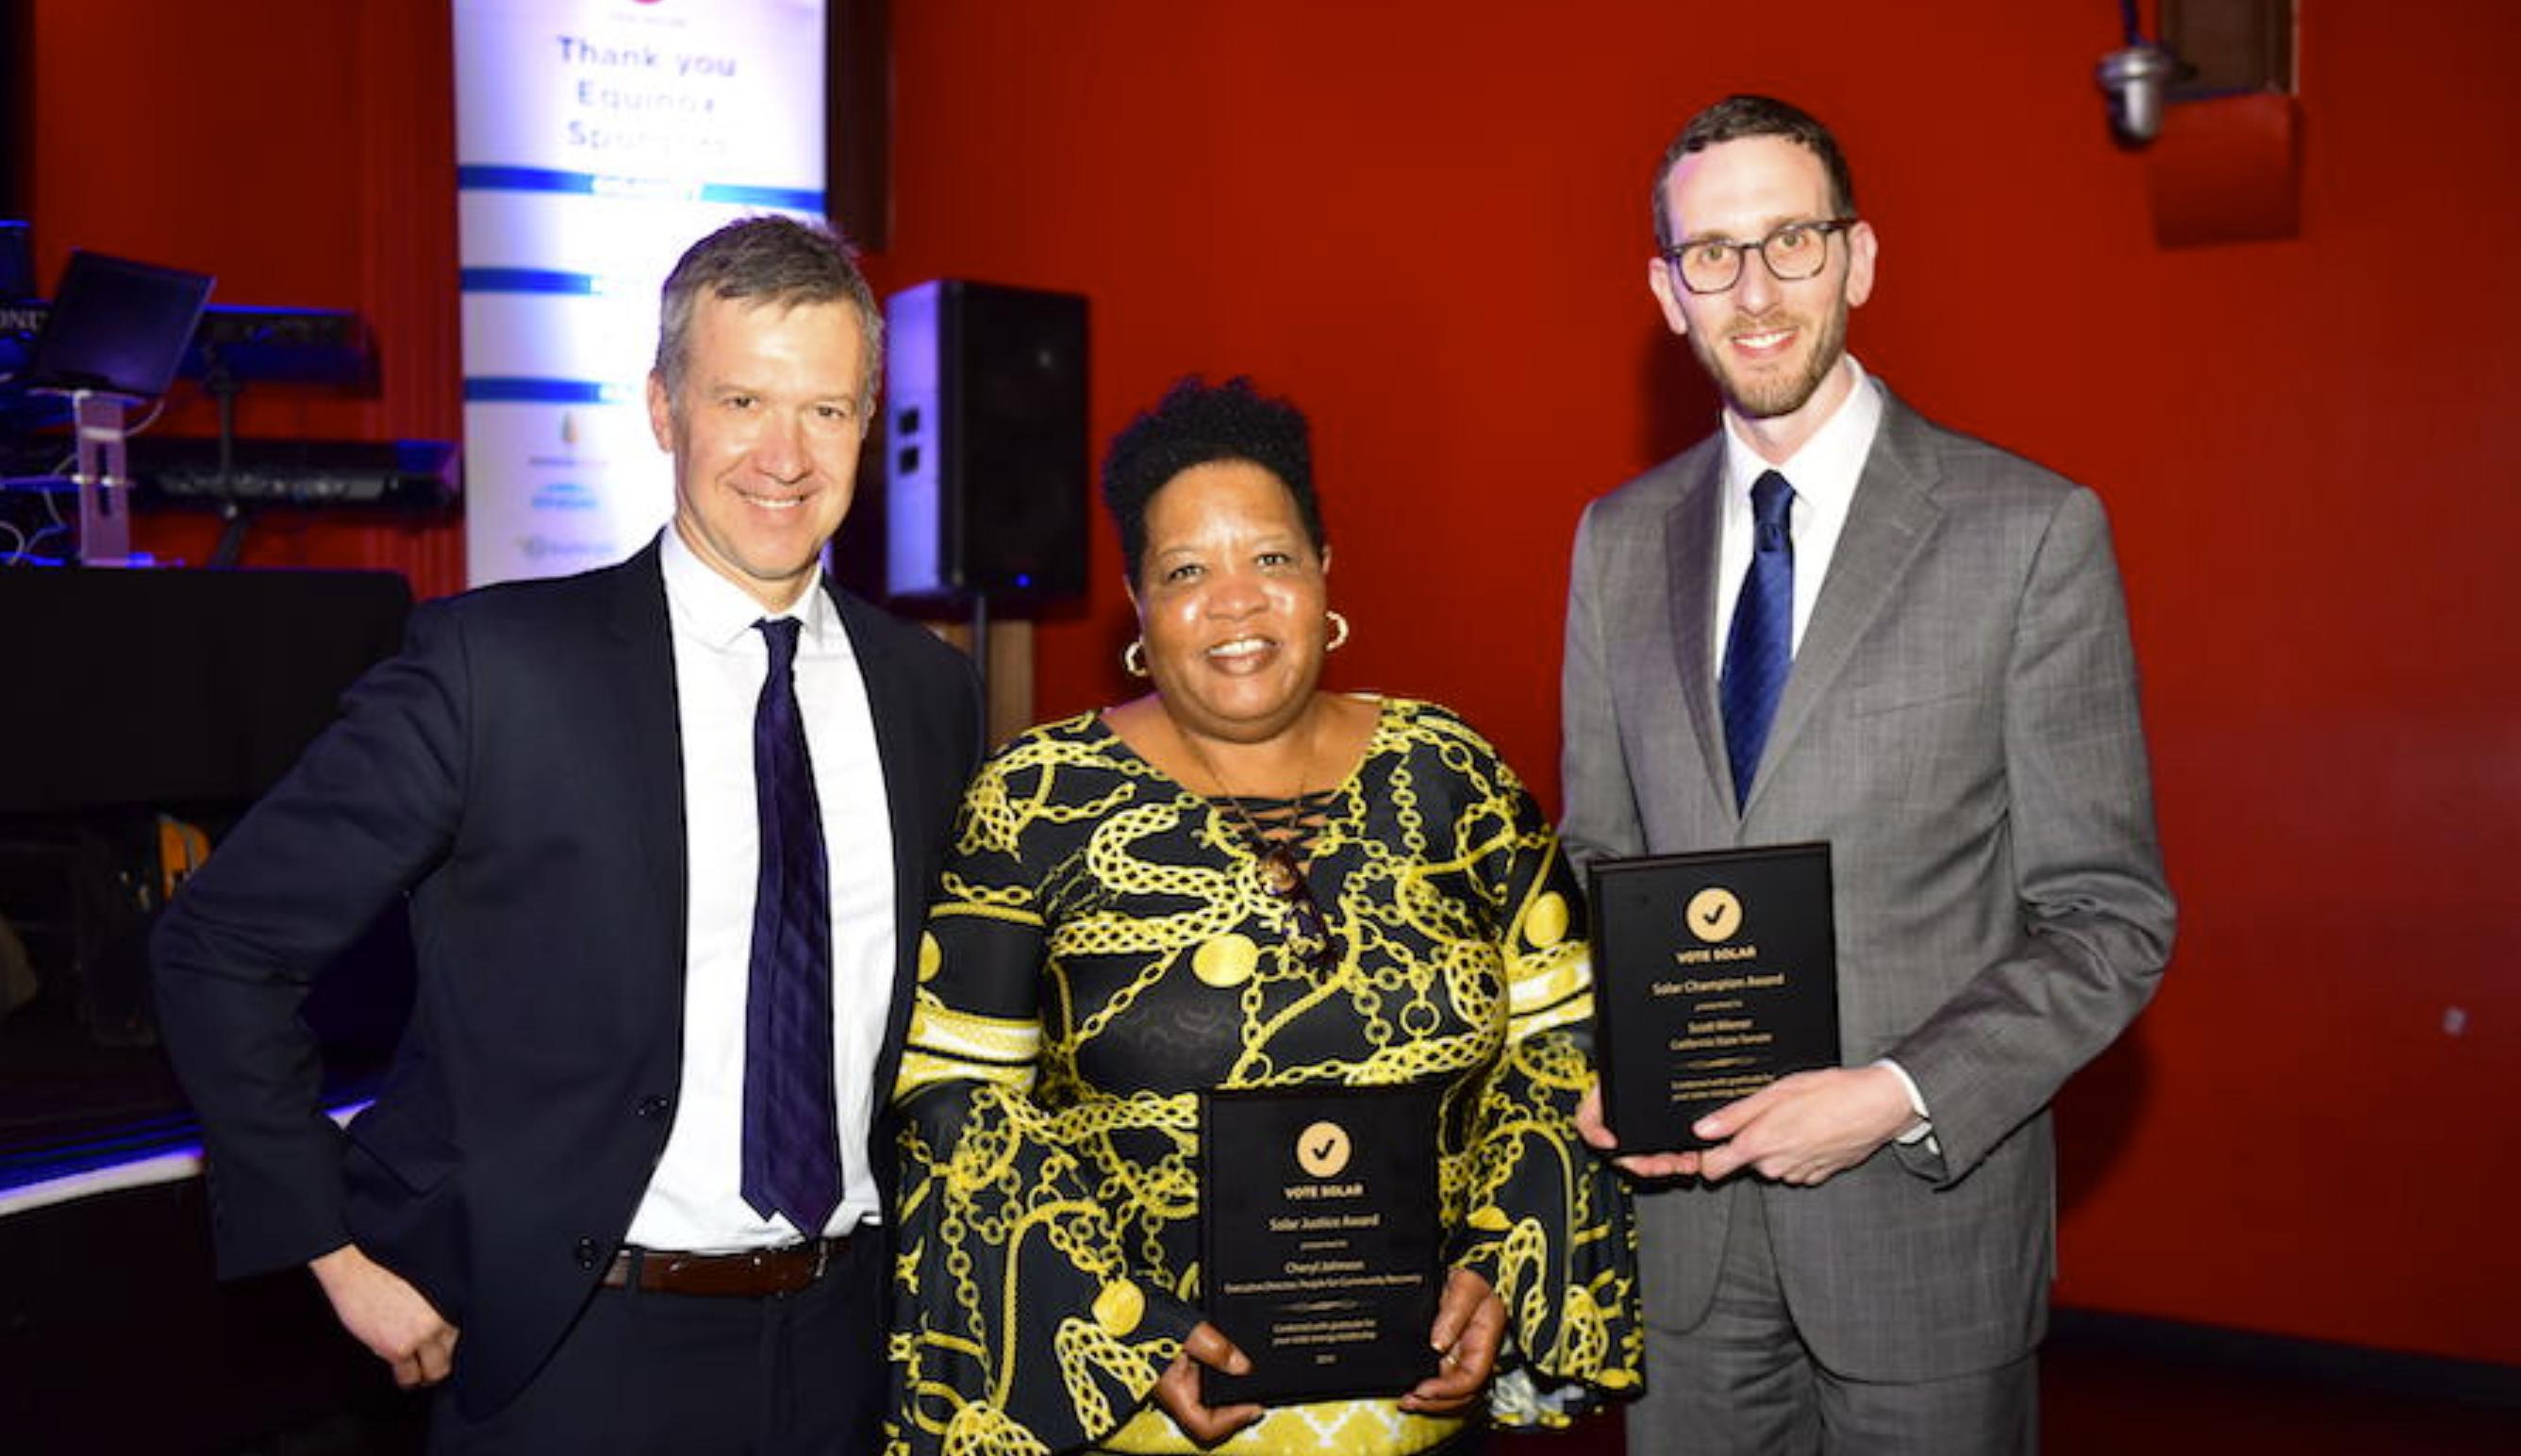 Adam with Vote Solar's 2018 Solar Justice Award Honoree Cheryl Johnson and Solar Champion Award Honoree California State Senator Scott Wiener